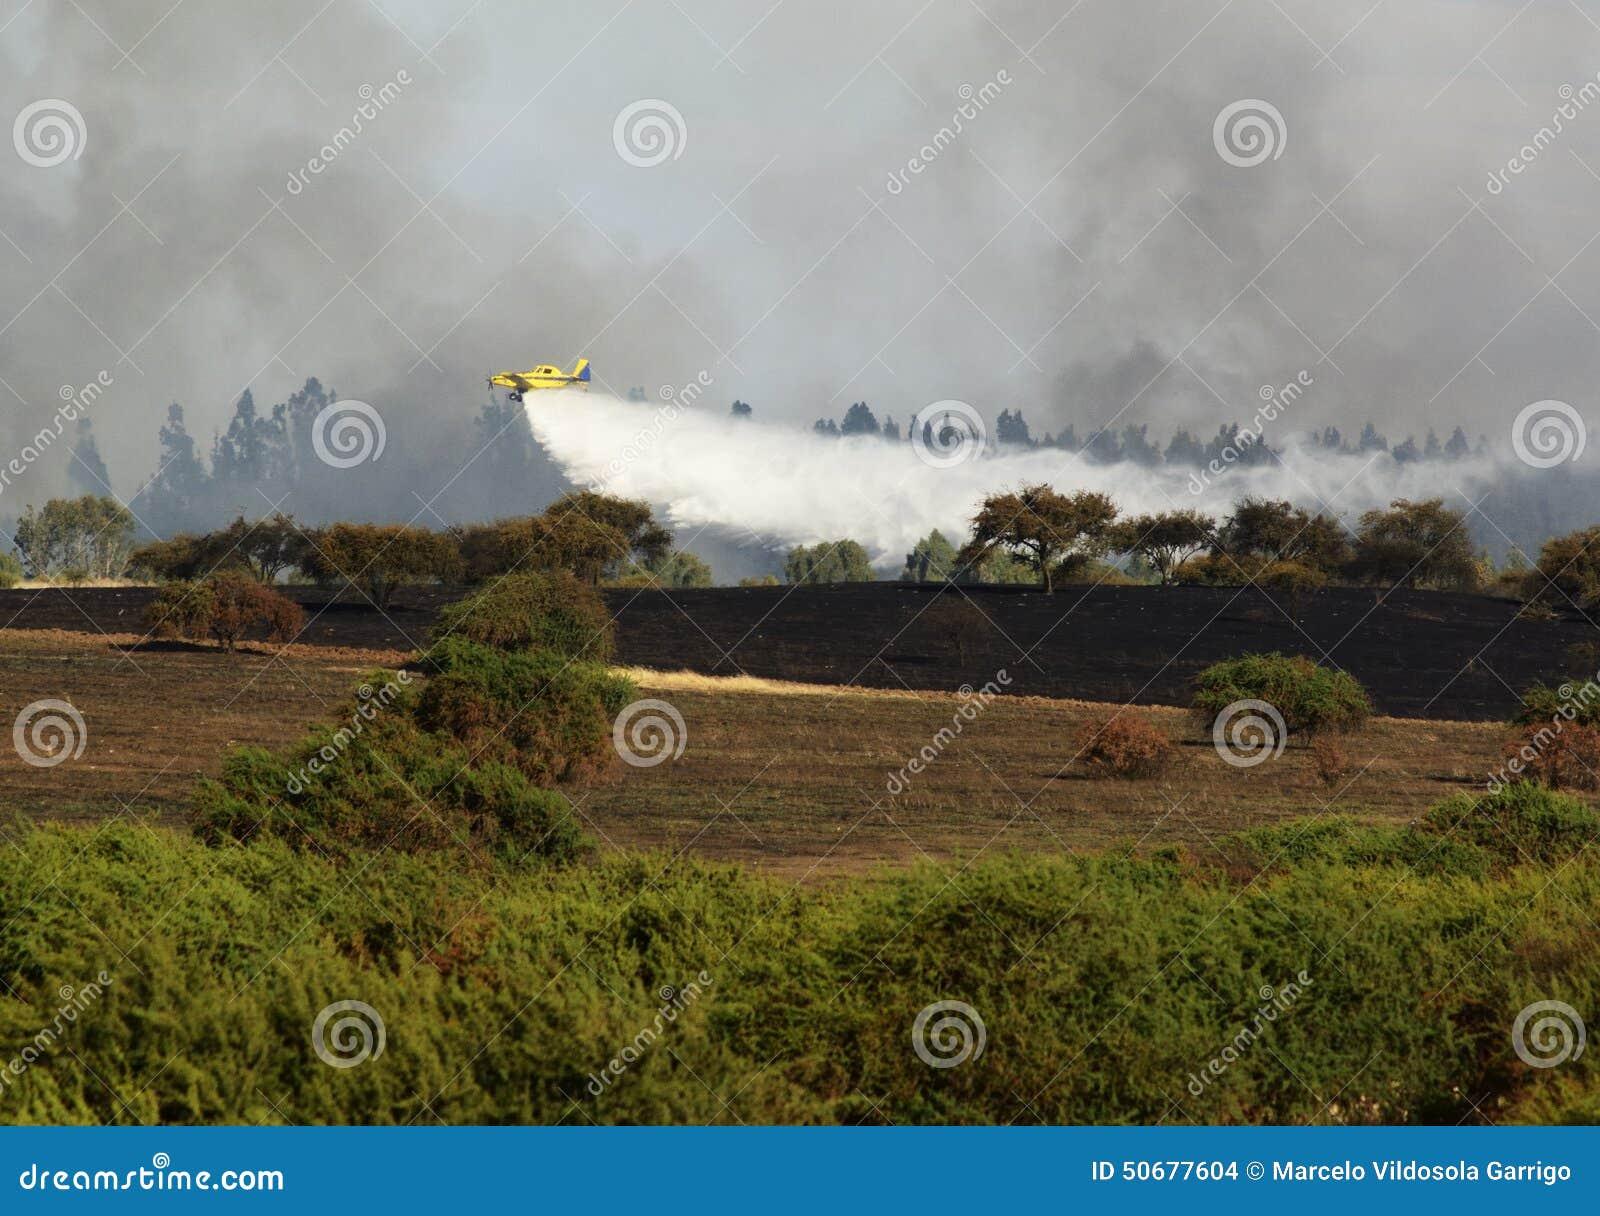 Download 野火 库存照片. 图片 包括有 运输, 坦克, alameda, 灾害, 结构树, 森林, 消防队员, 污染 - 50677604